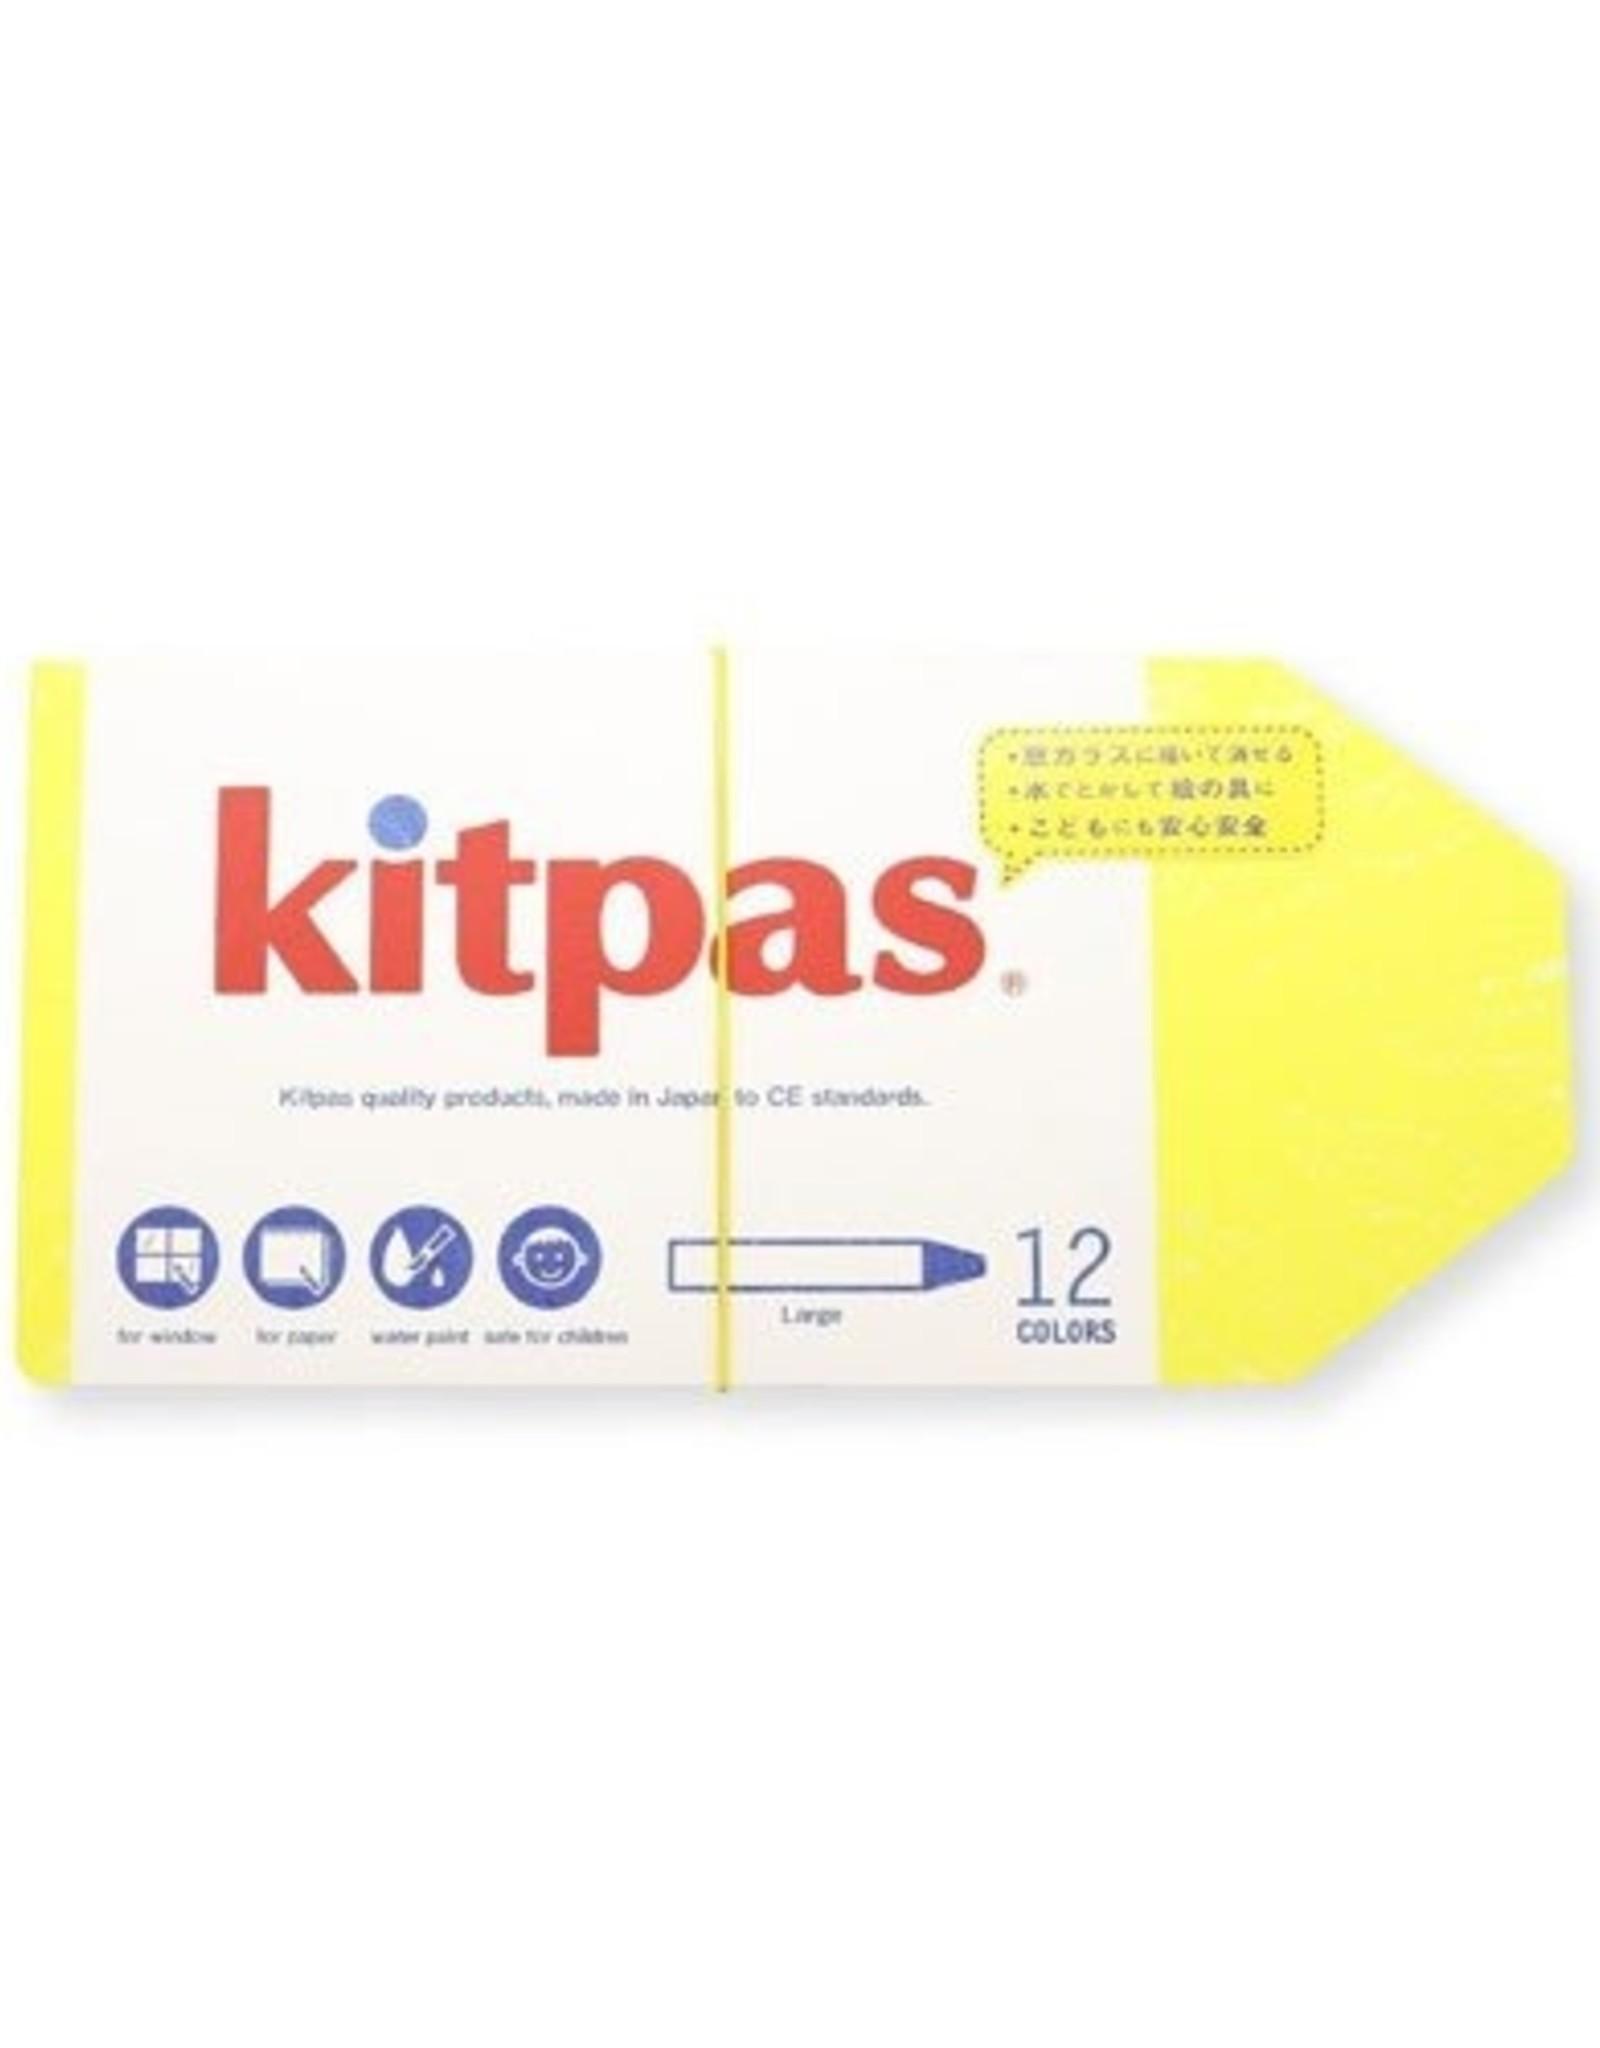 Kitpas Large 12 Colors